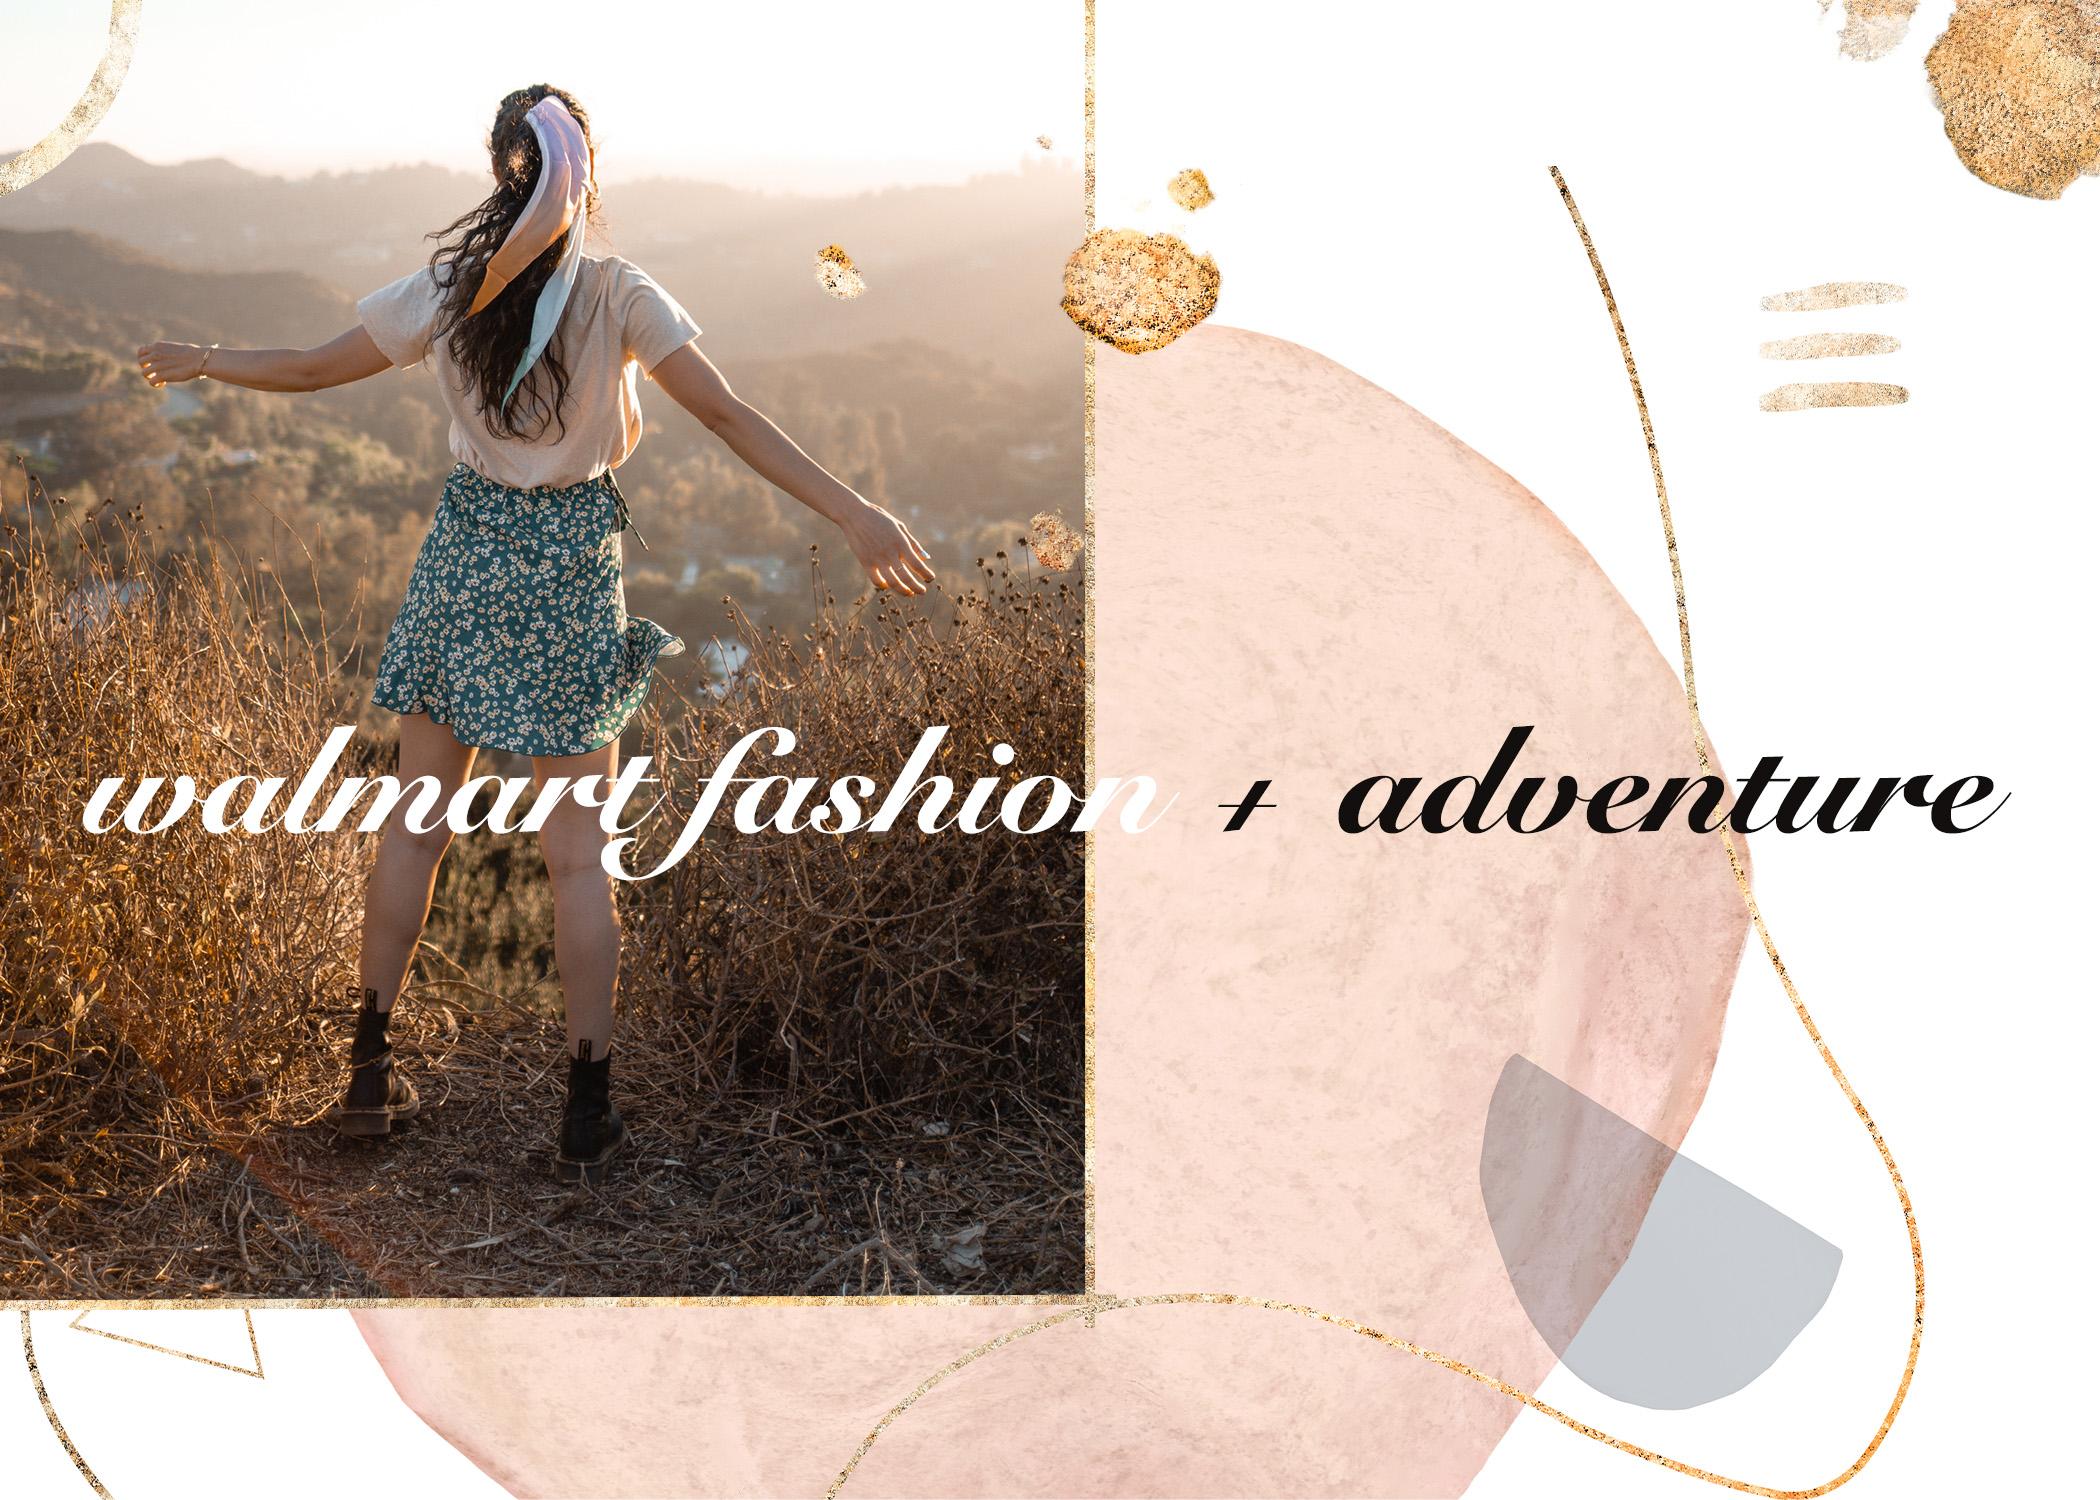 walmart fashion // adventure